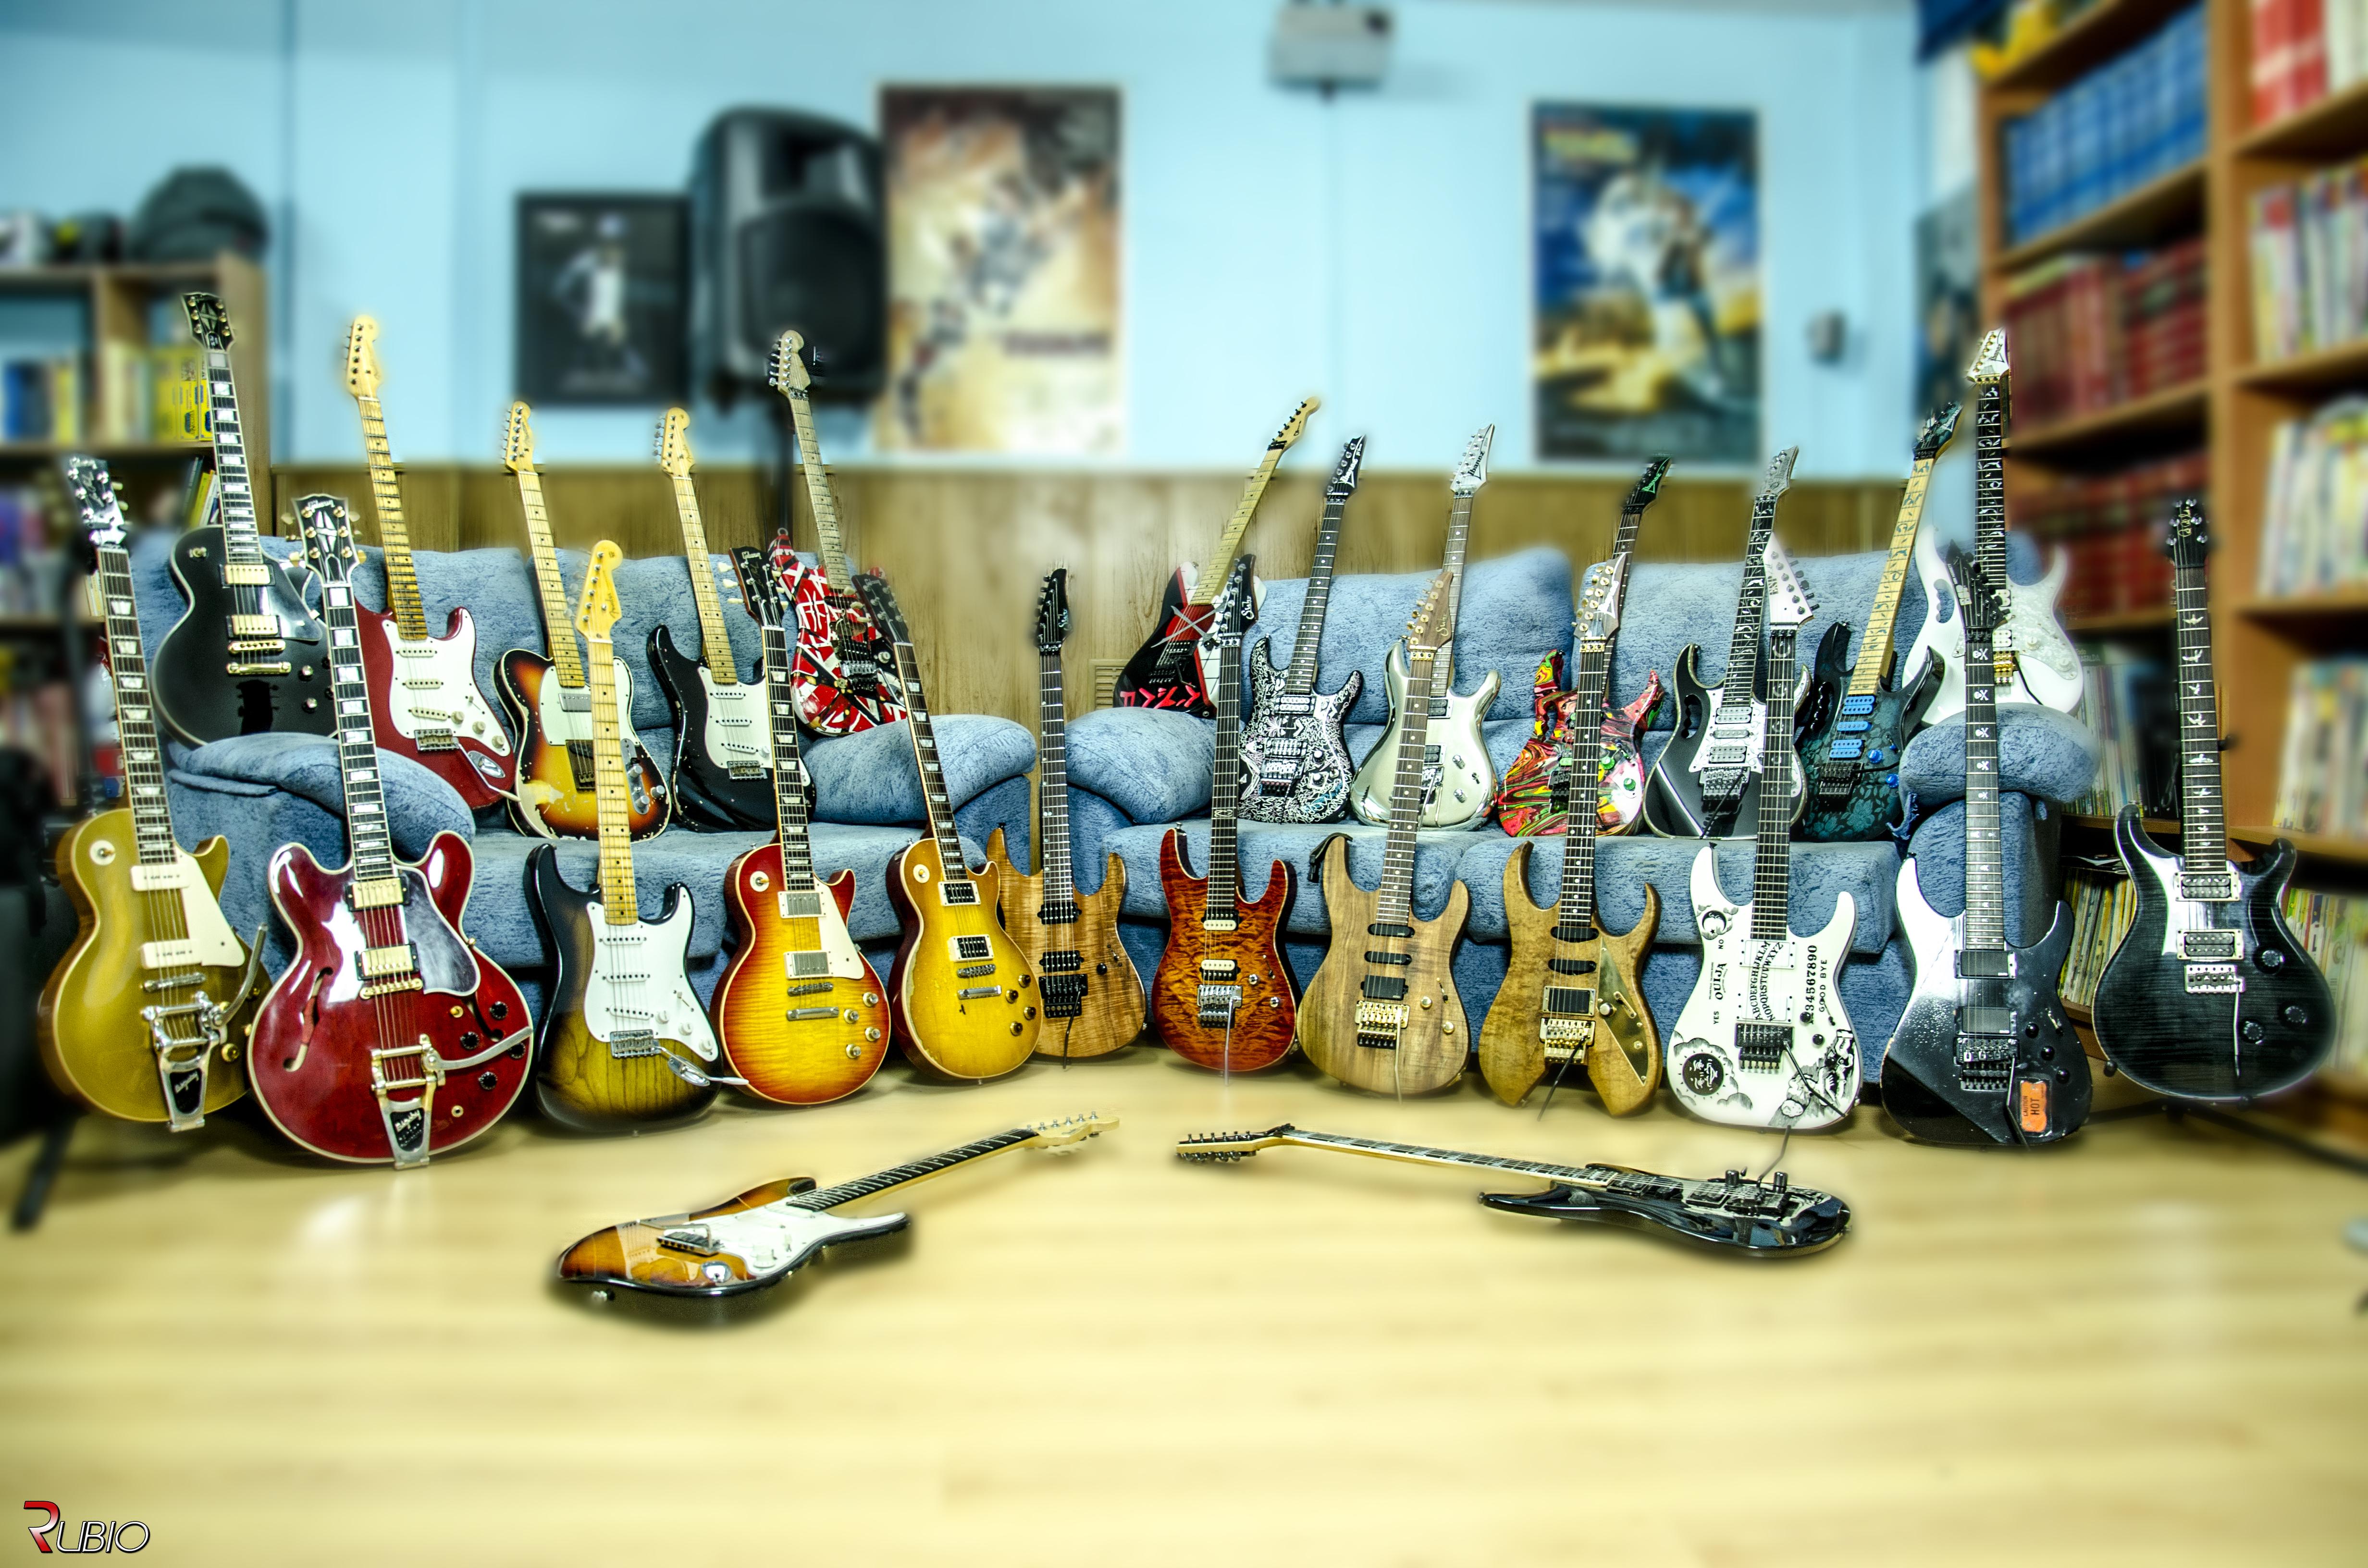 Coleccion-Guitarras-Sofa.jpg